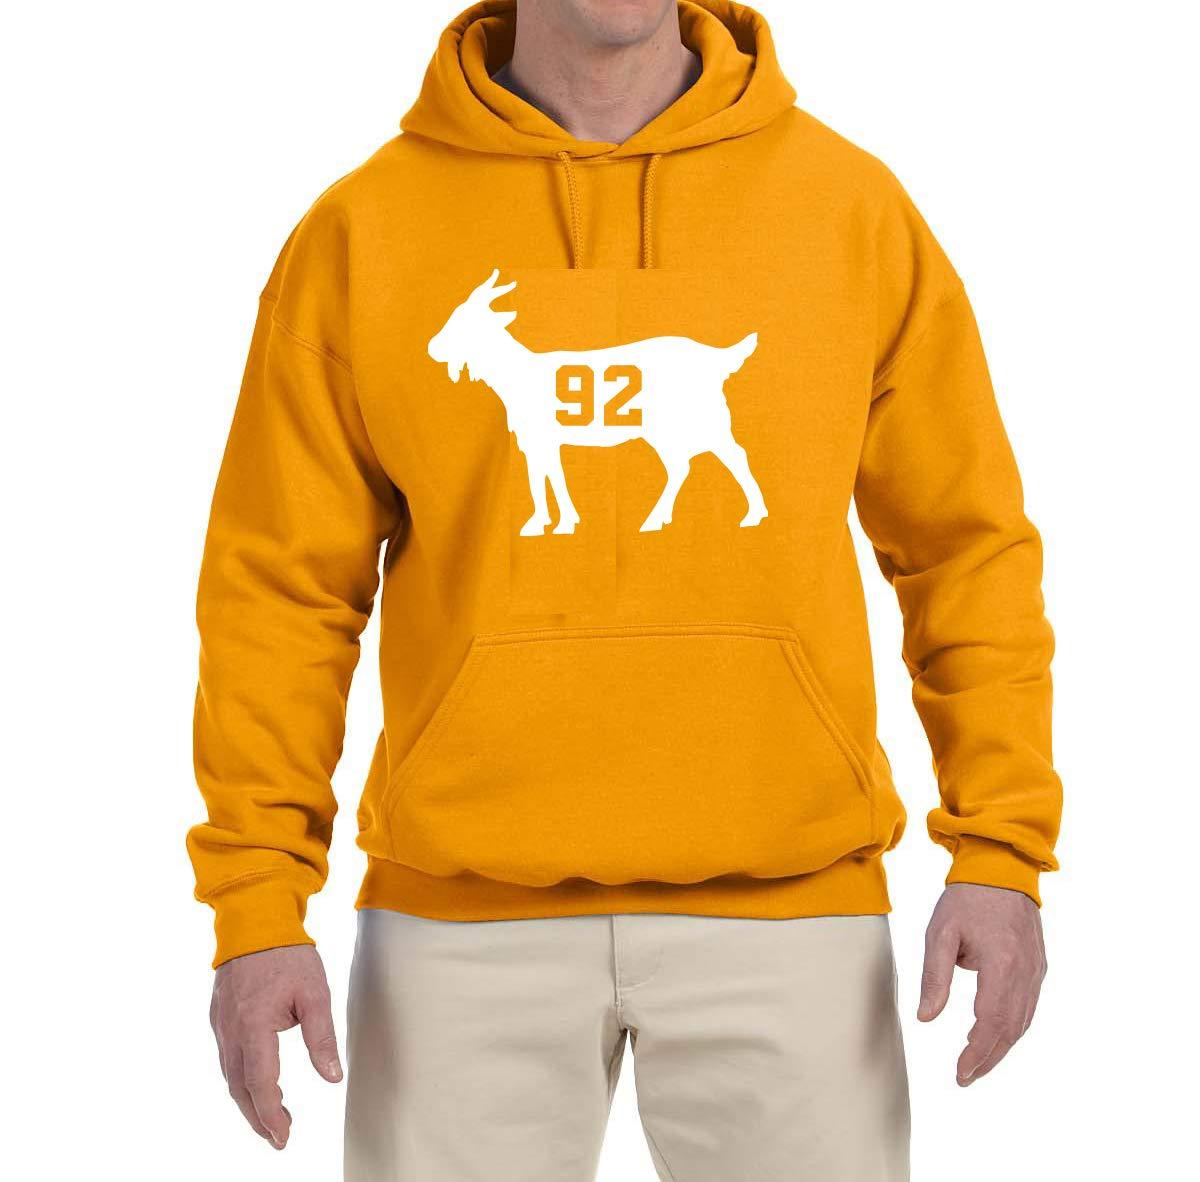 Tobin Clothing Orange Tennessee White Goat Hooded Shirts